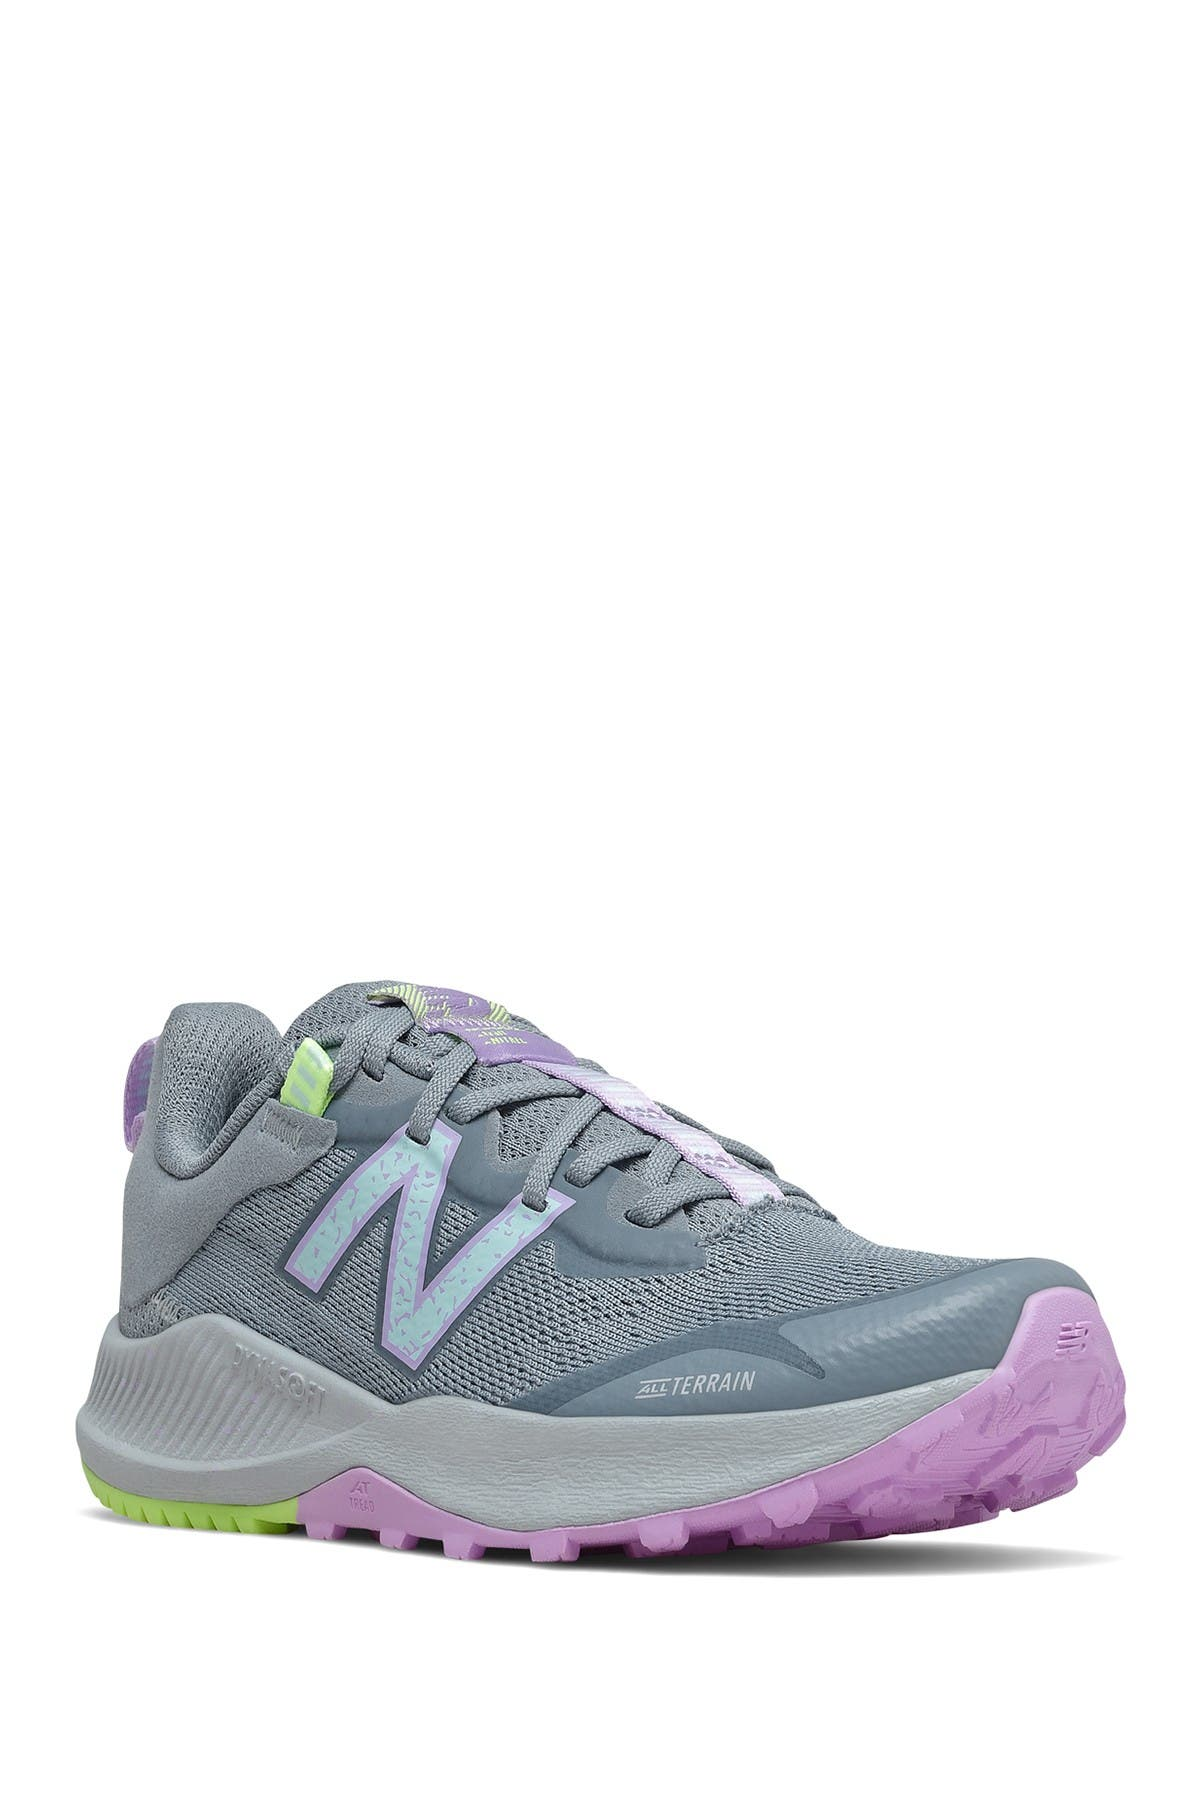 Image of New Balance Nitrel Trail Running Shoe